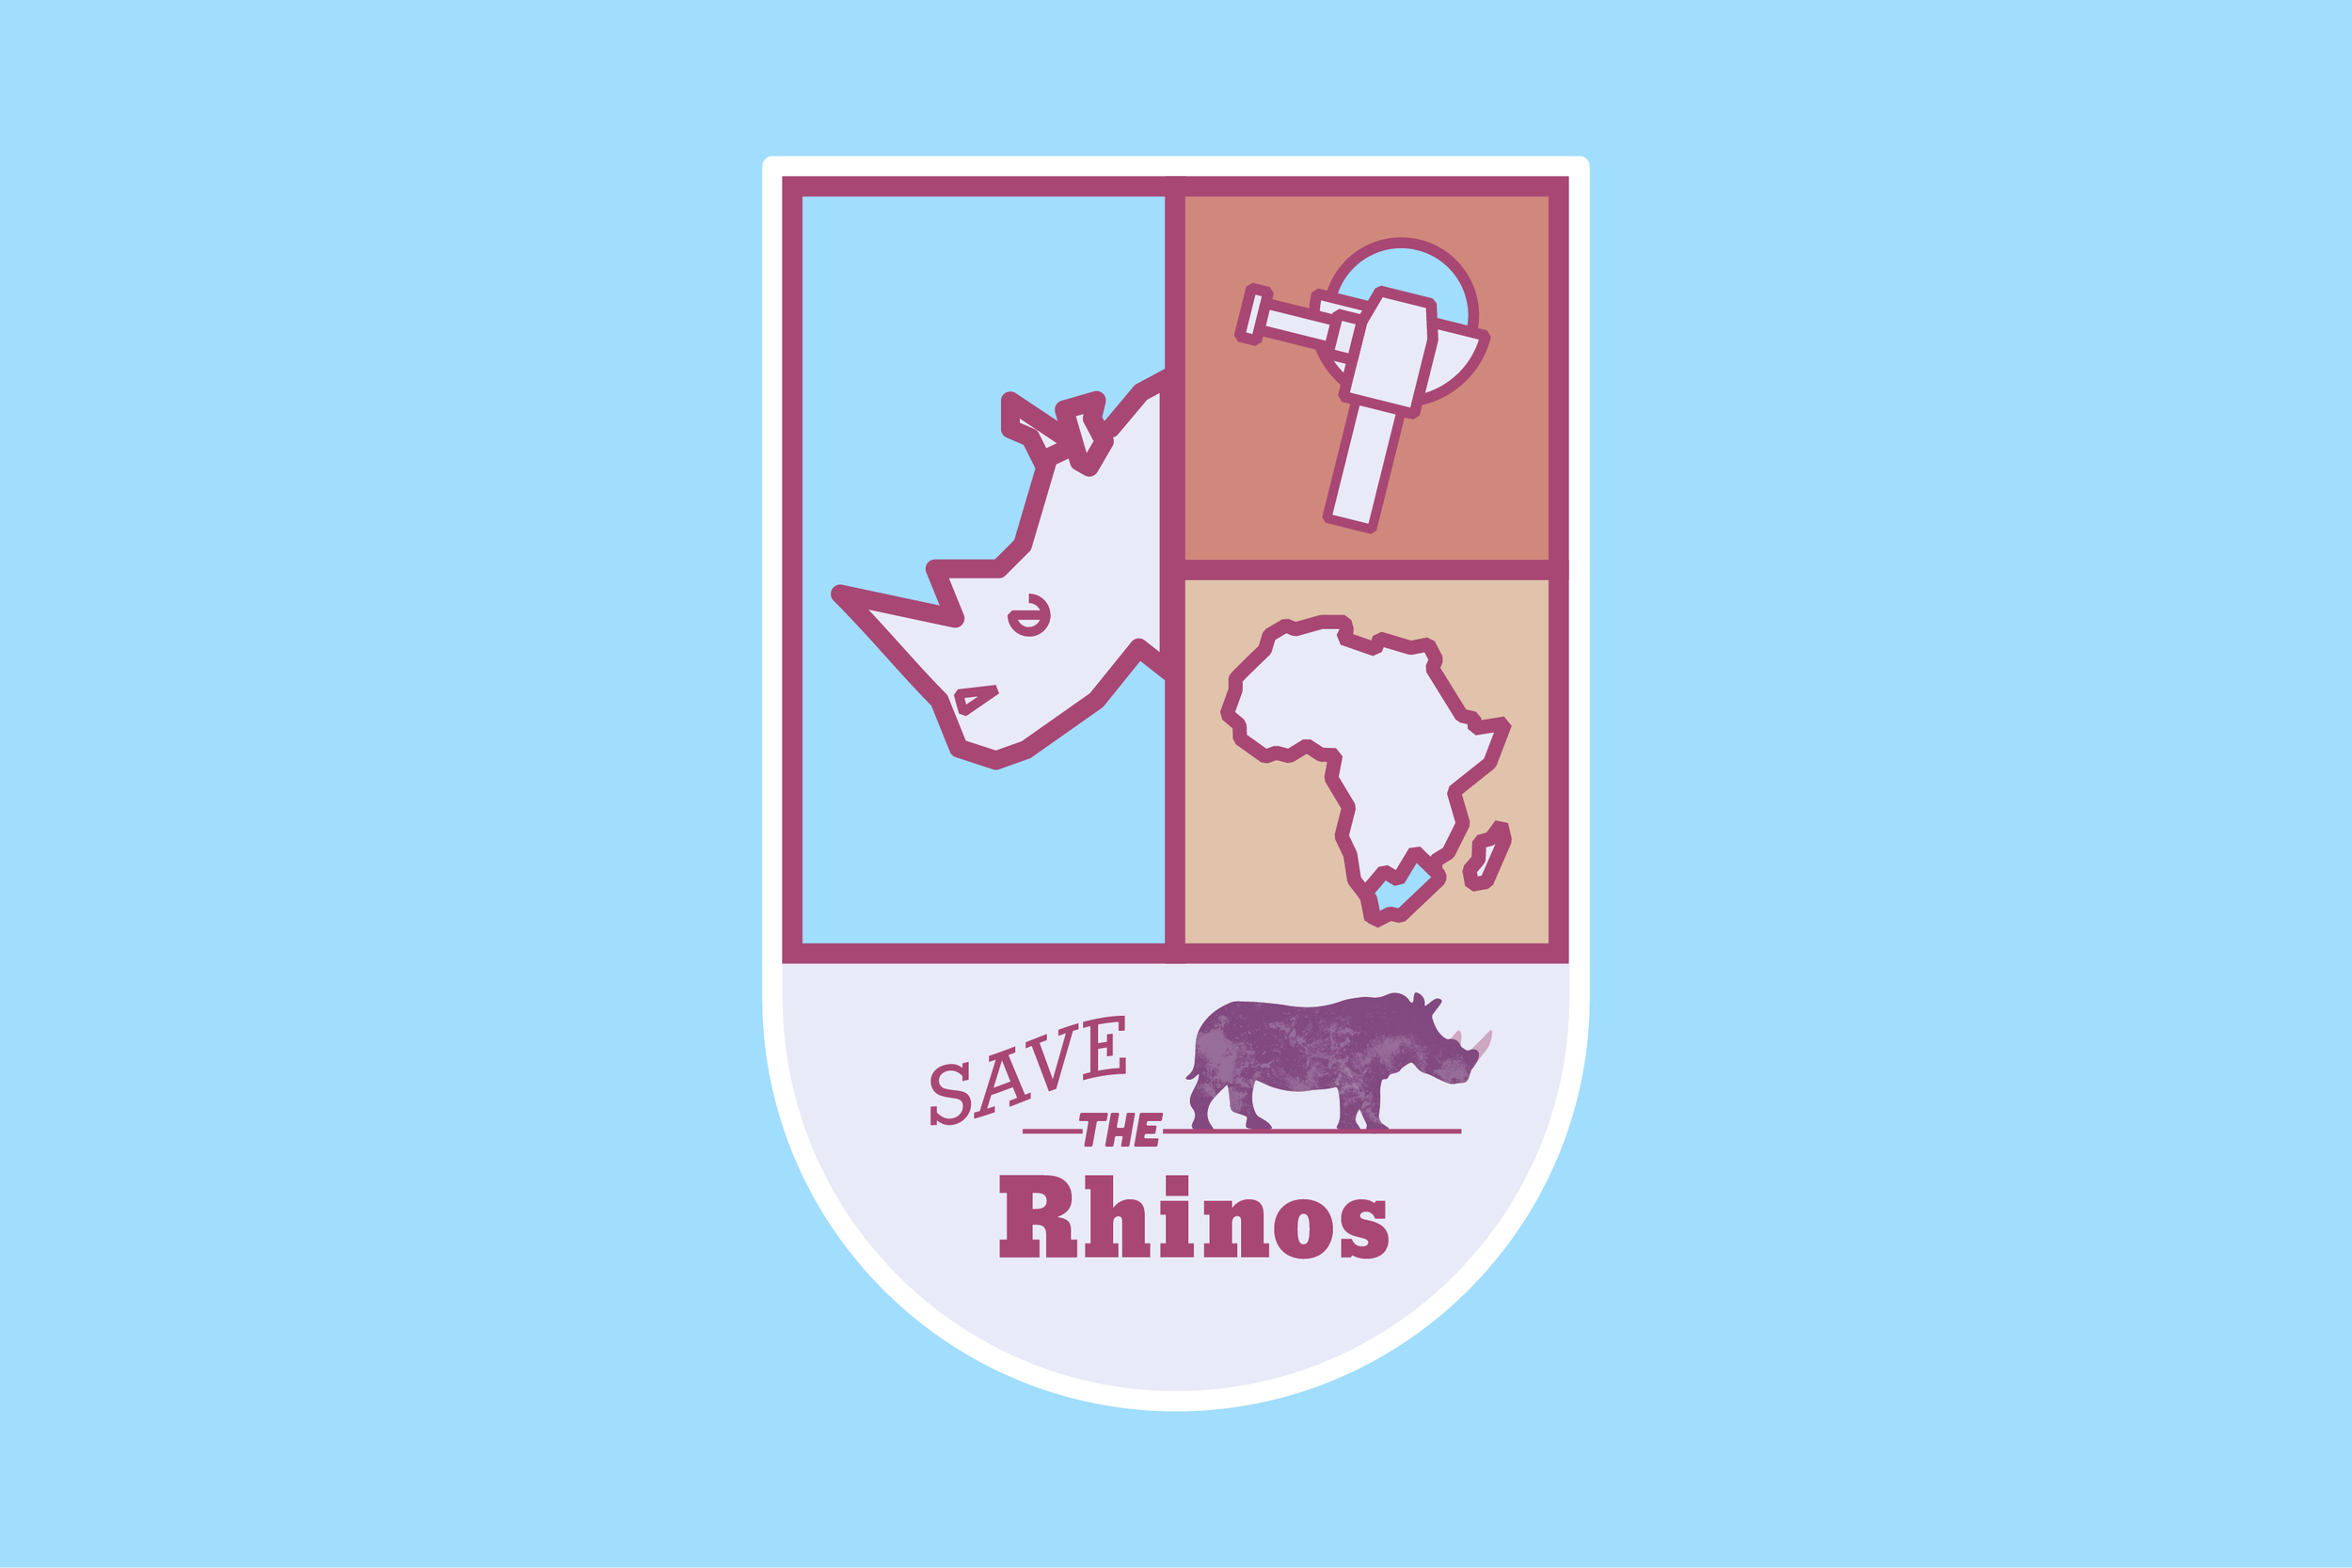 BF_rhinos.png